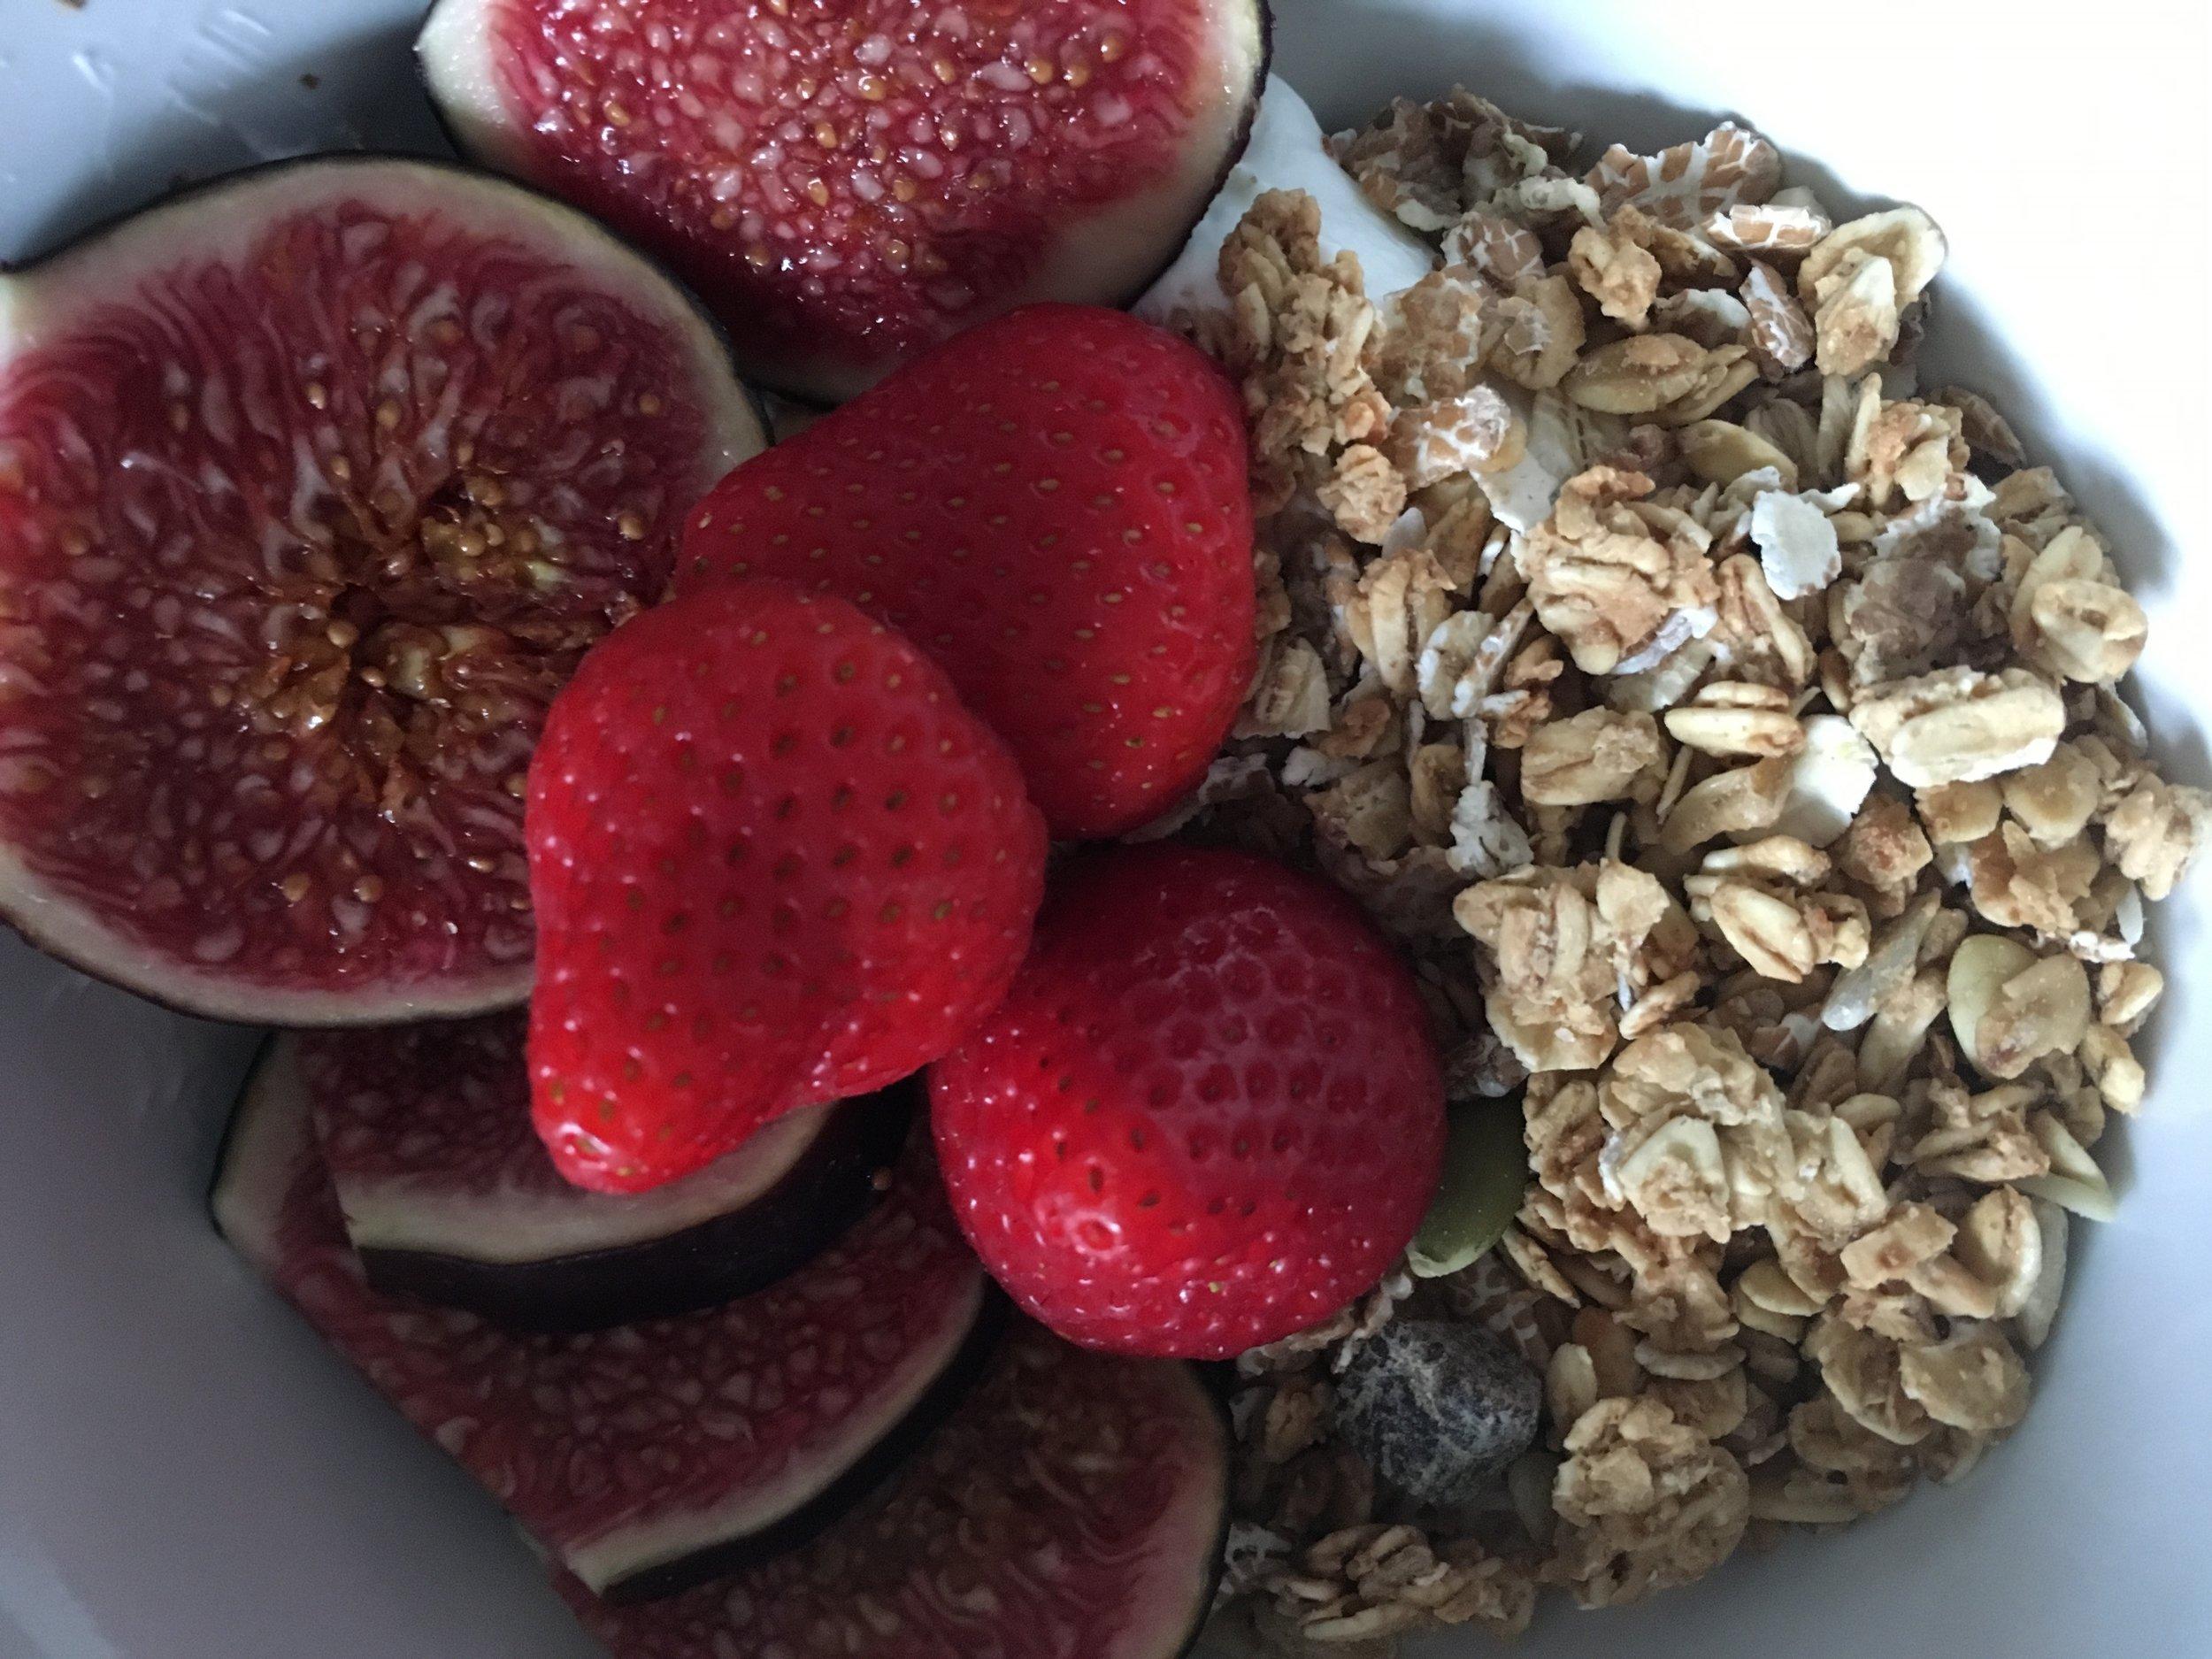 Greek yogurt, fresh fruit and muesli - what a breakfast?!